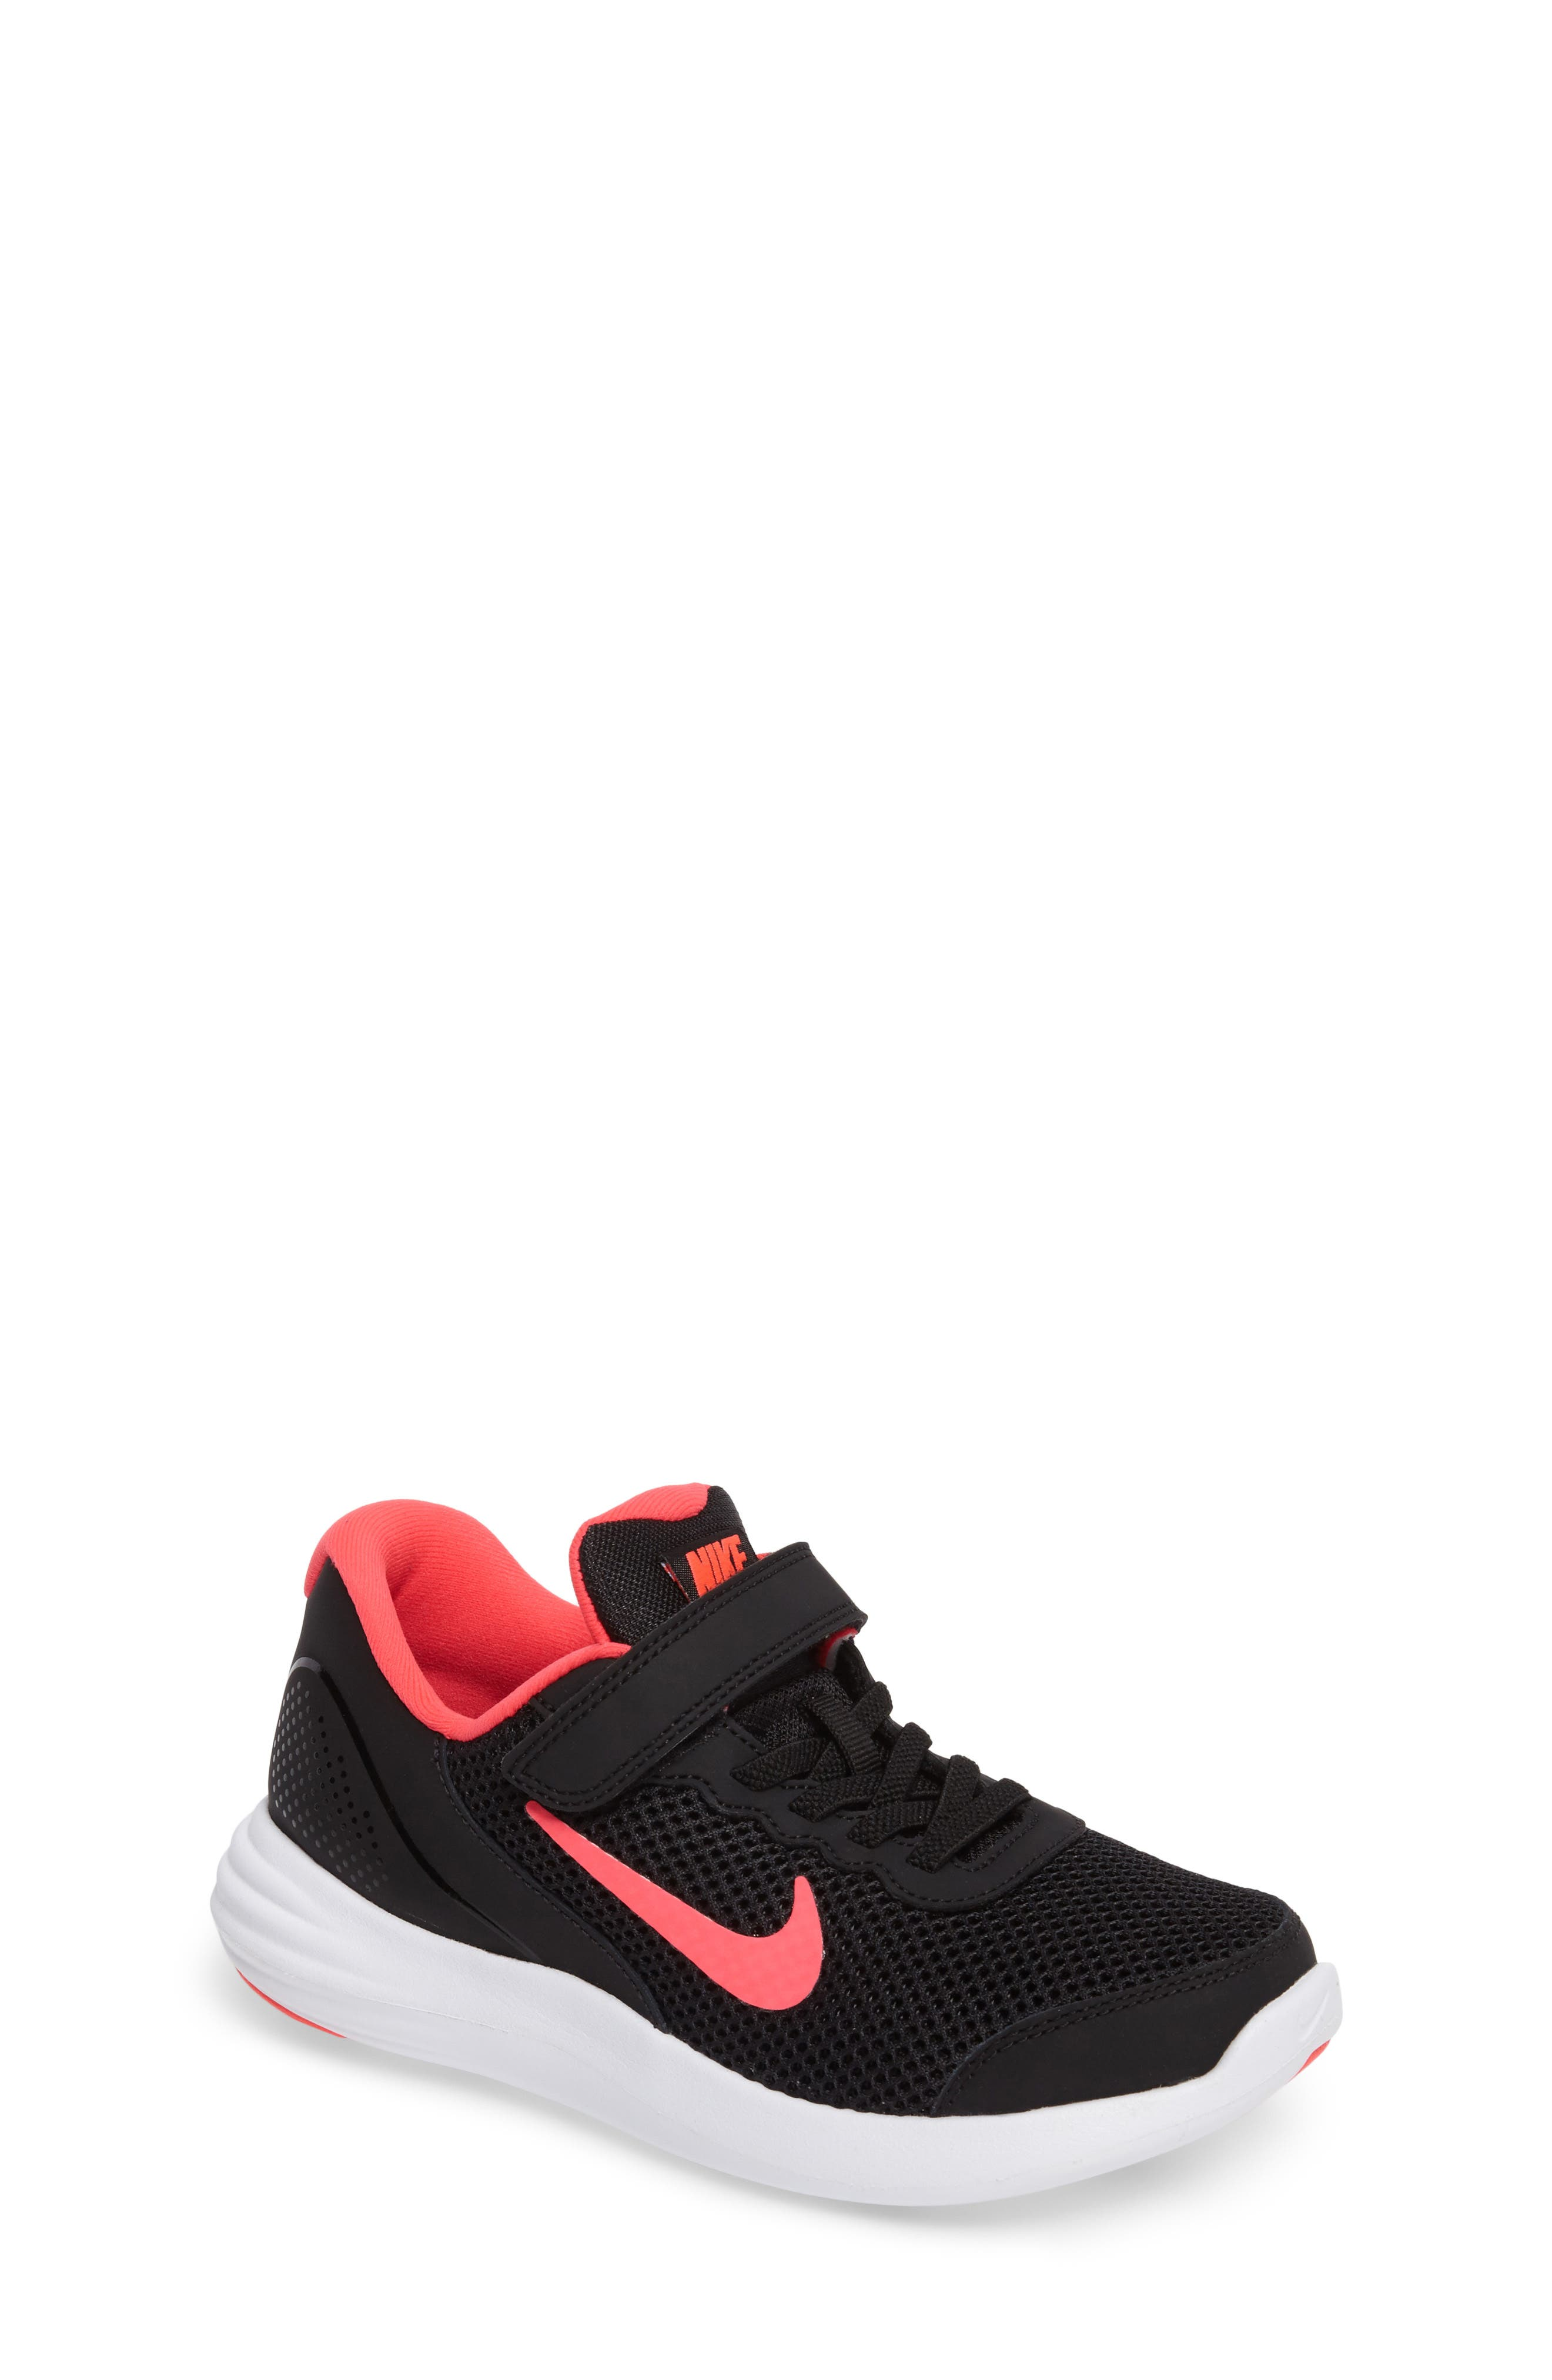 Lunar Apparent Sneaker,                         Main,                         color, Black/ Racer Pink/ White